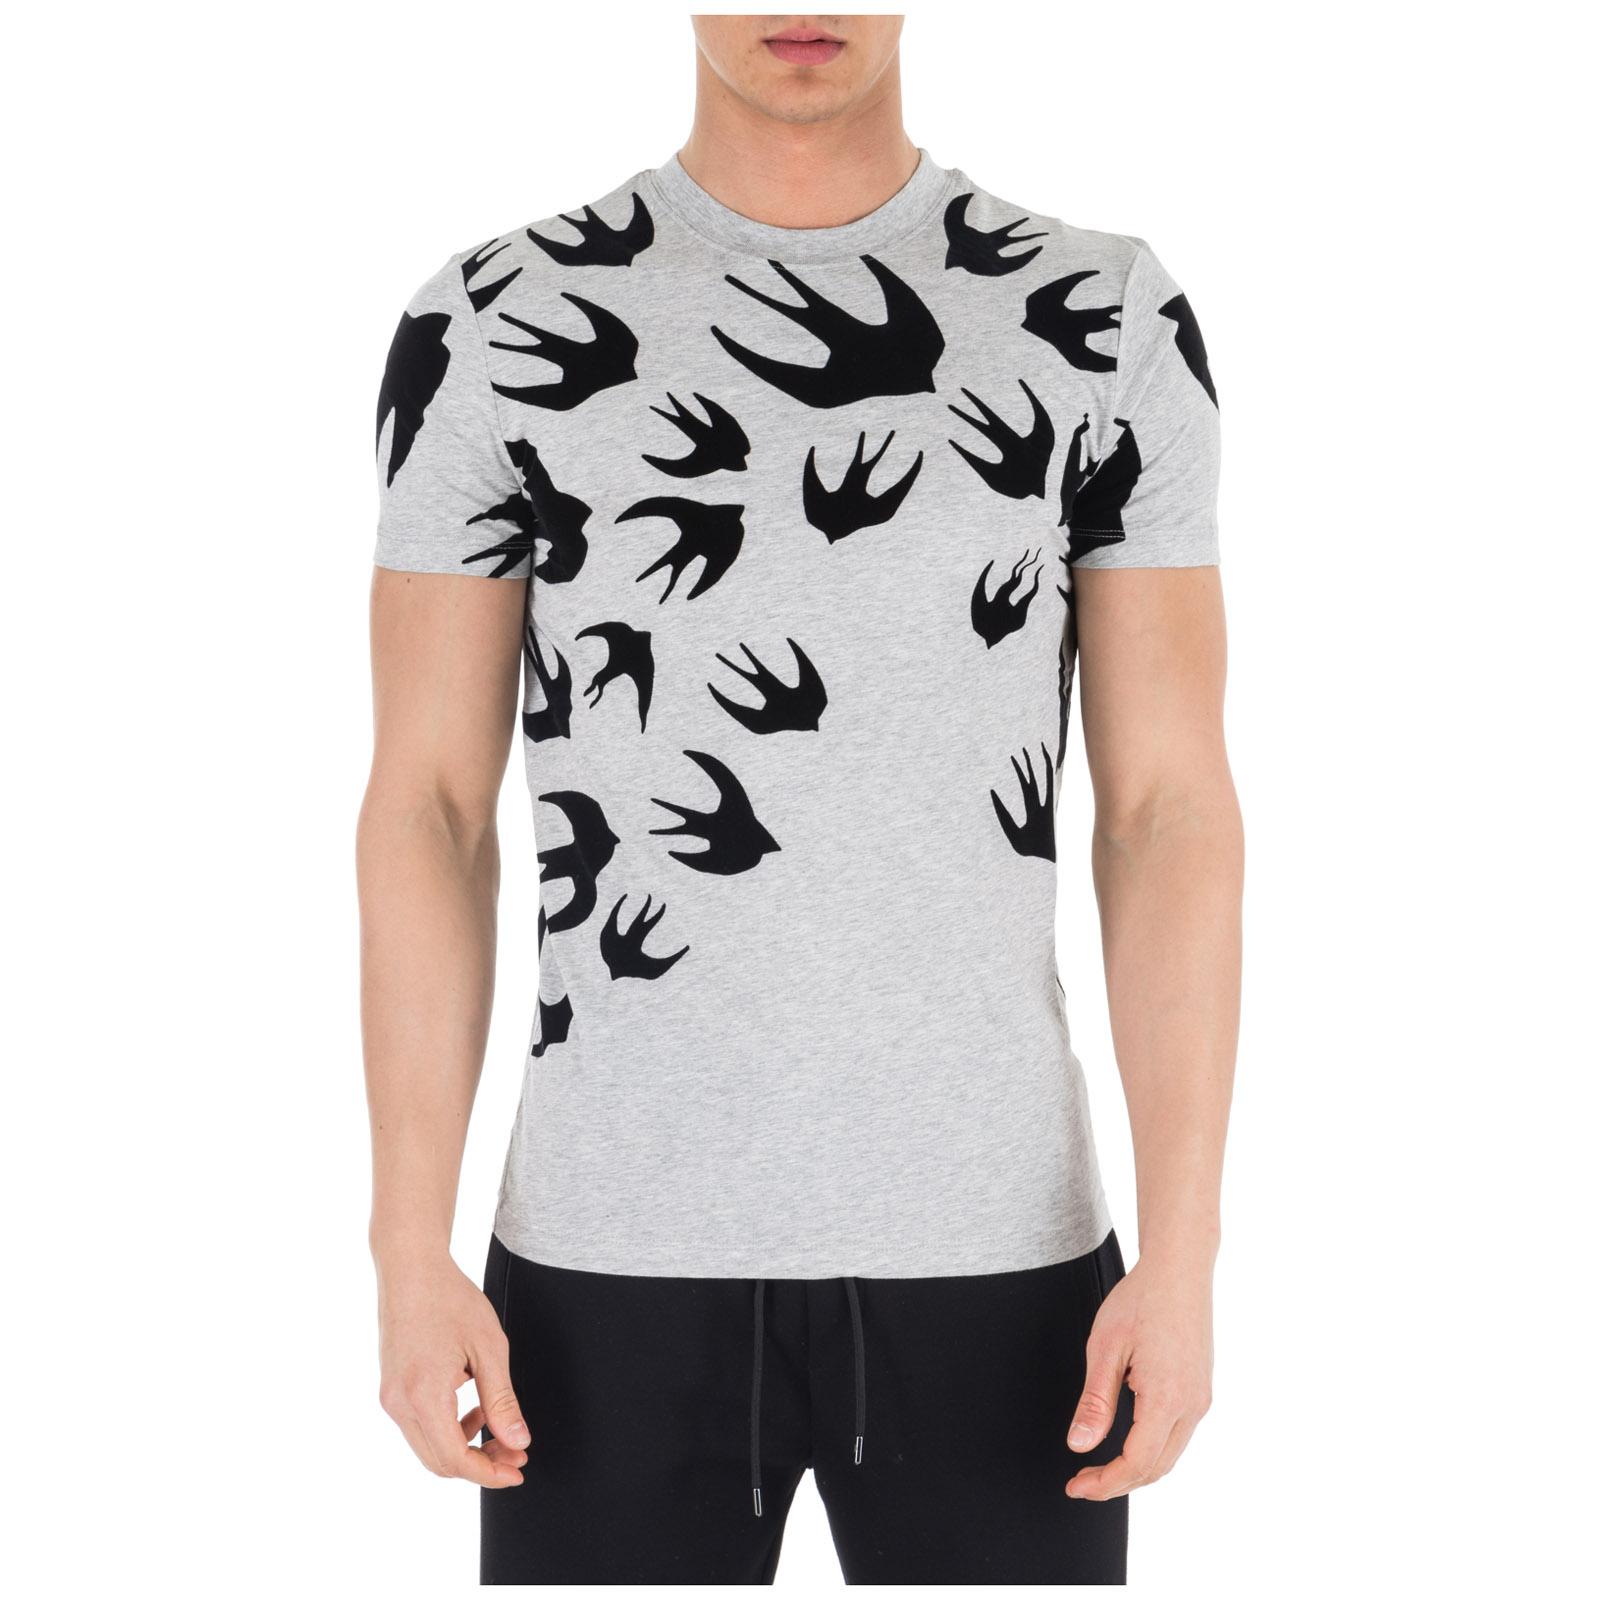 Camiseta de manga corta cuello redondo hombre swallow